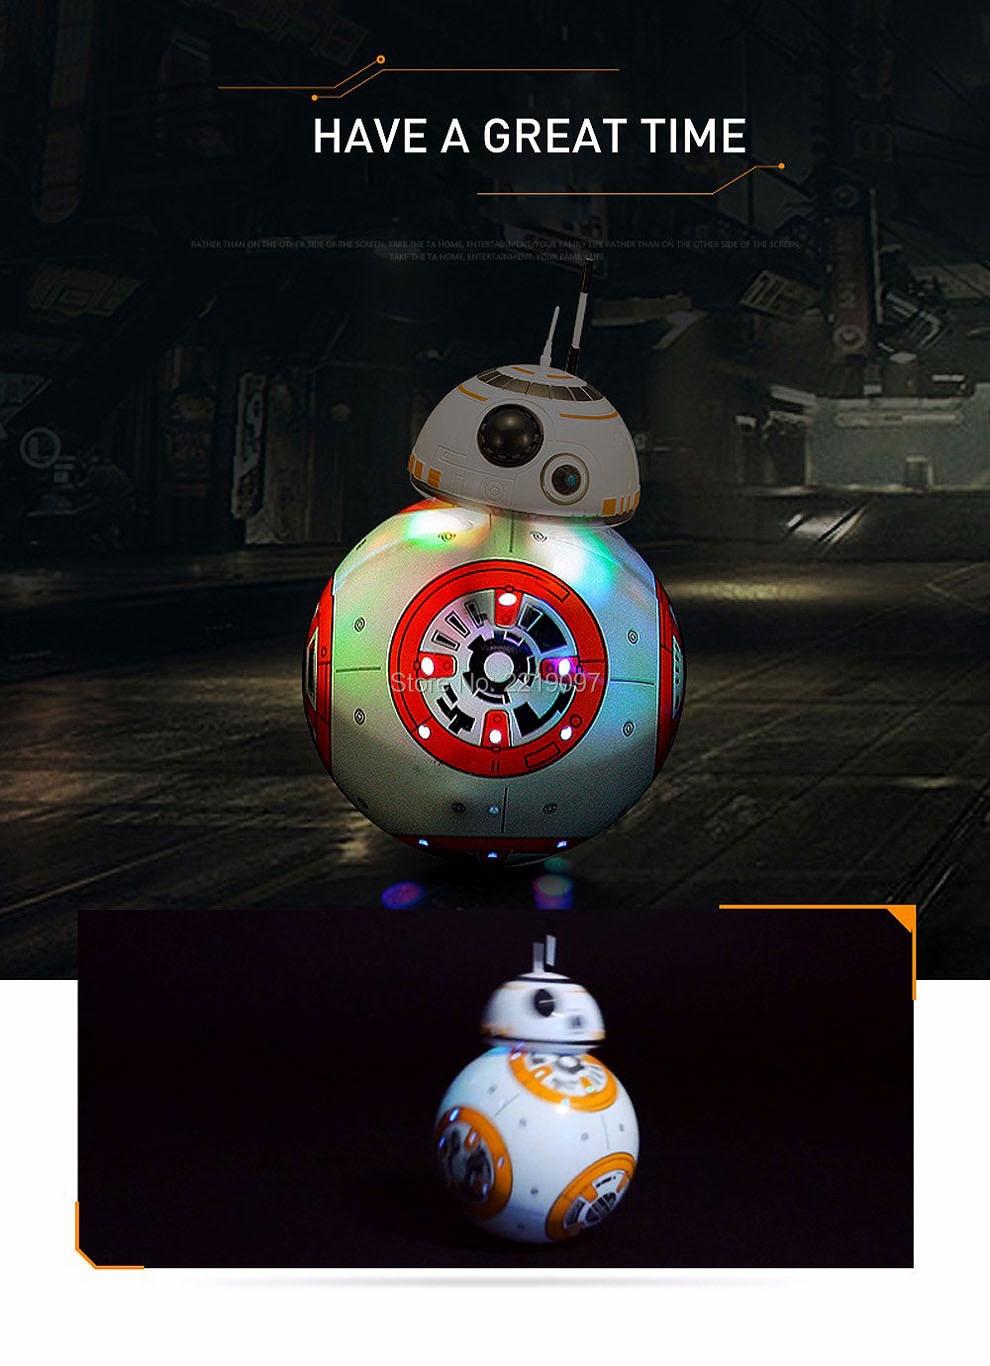 Star Wars Remote Control BB-8 Robot 20.5cm 21